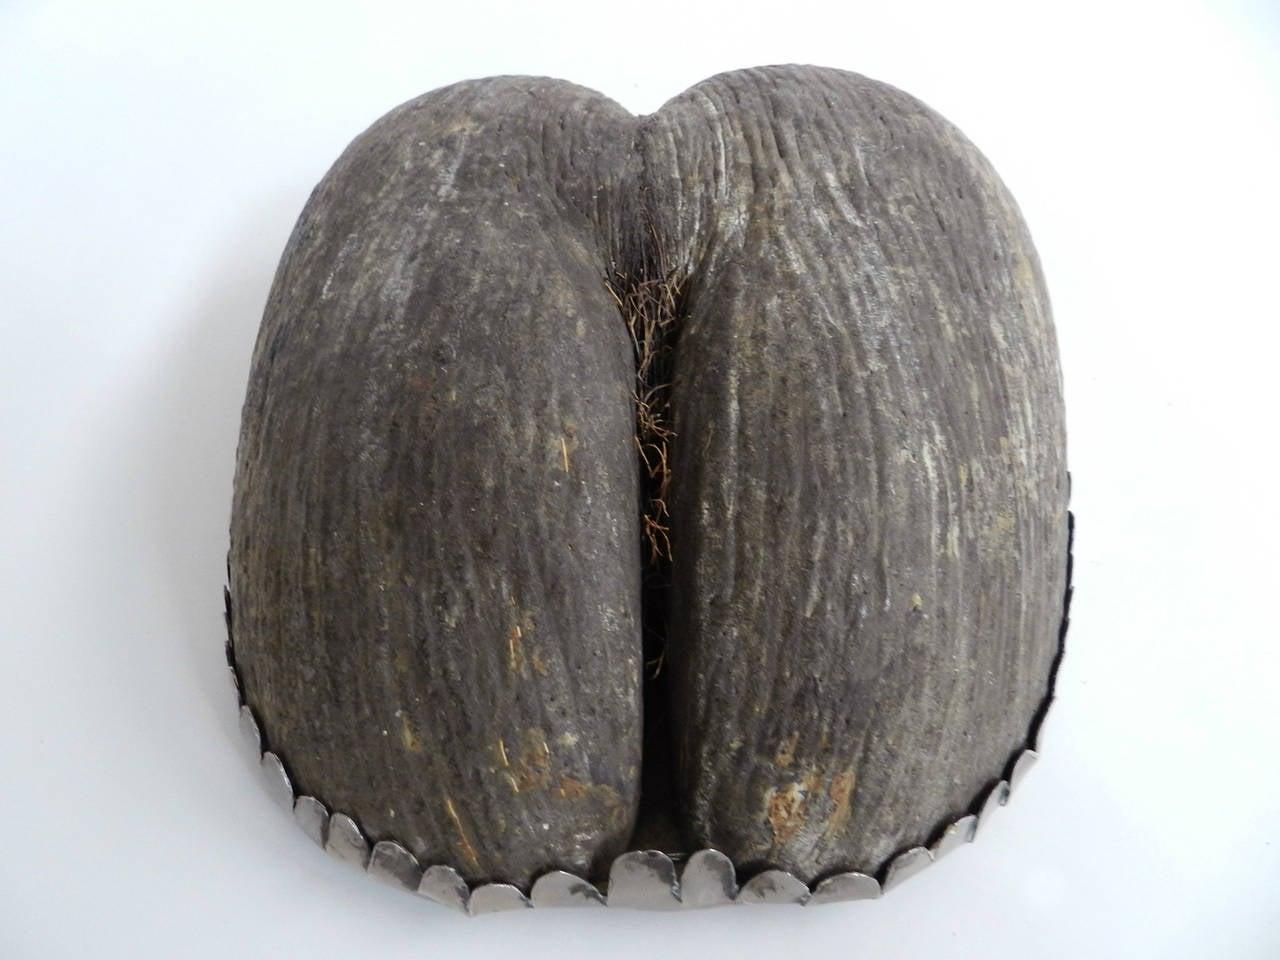 coconut bowls - photo #44